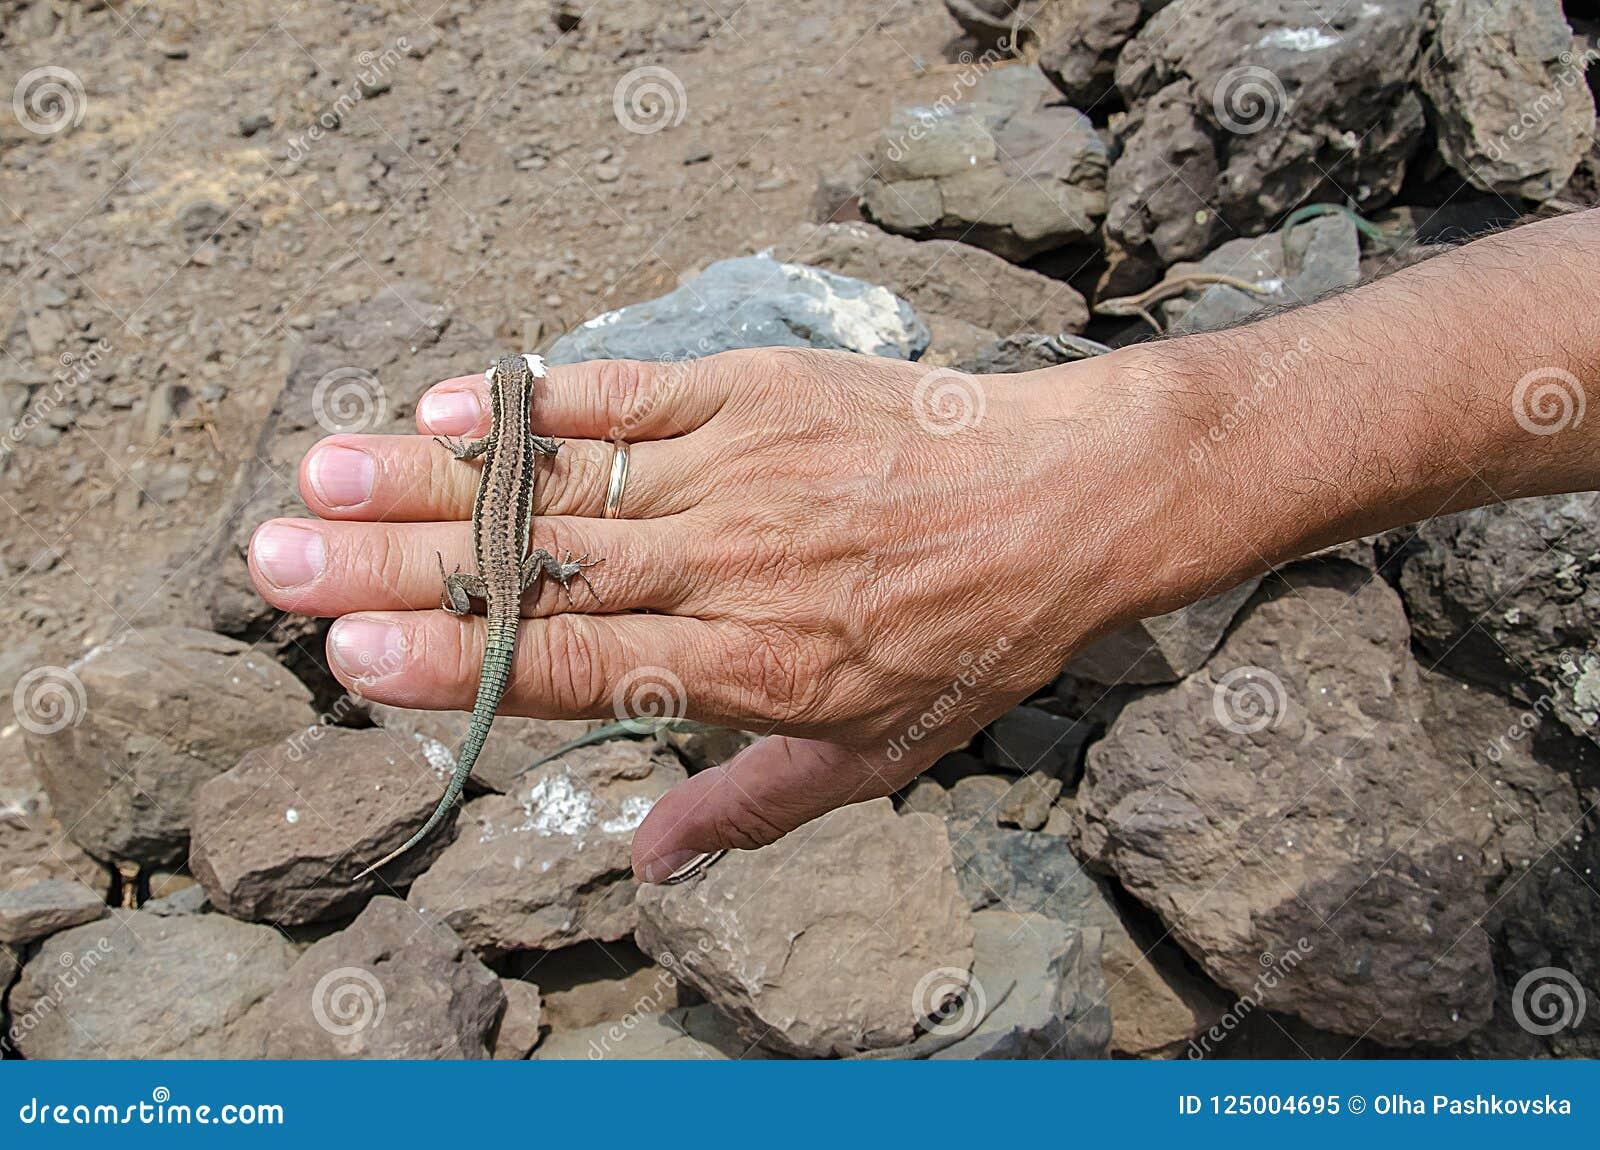 Lizard with food on human hand